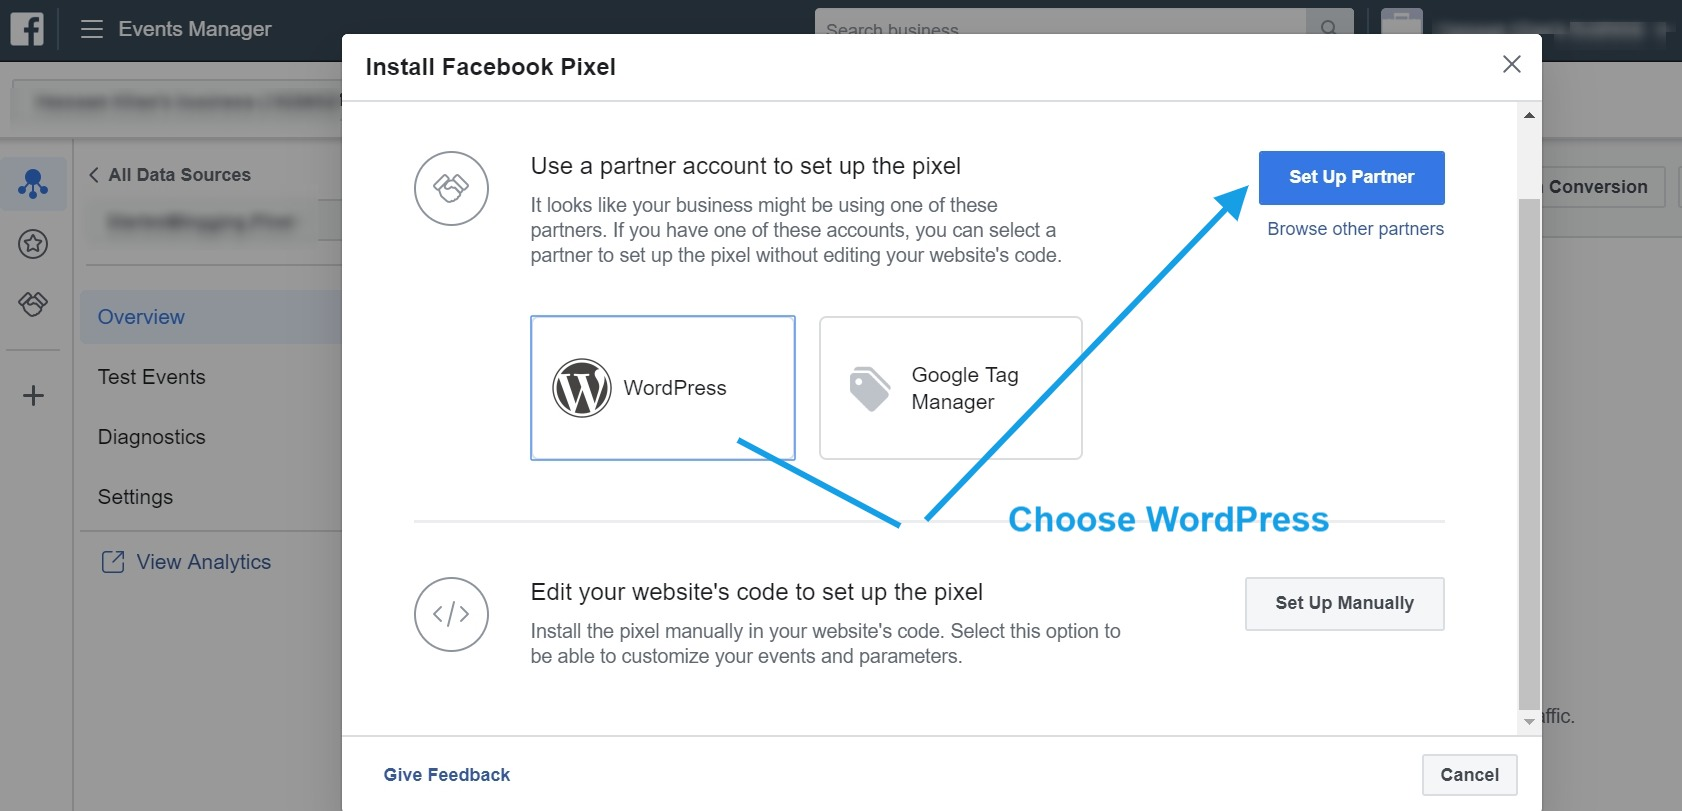 choose-wordpress-in-pixel